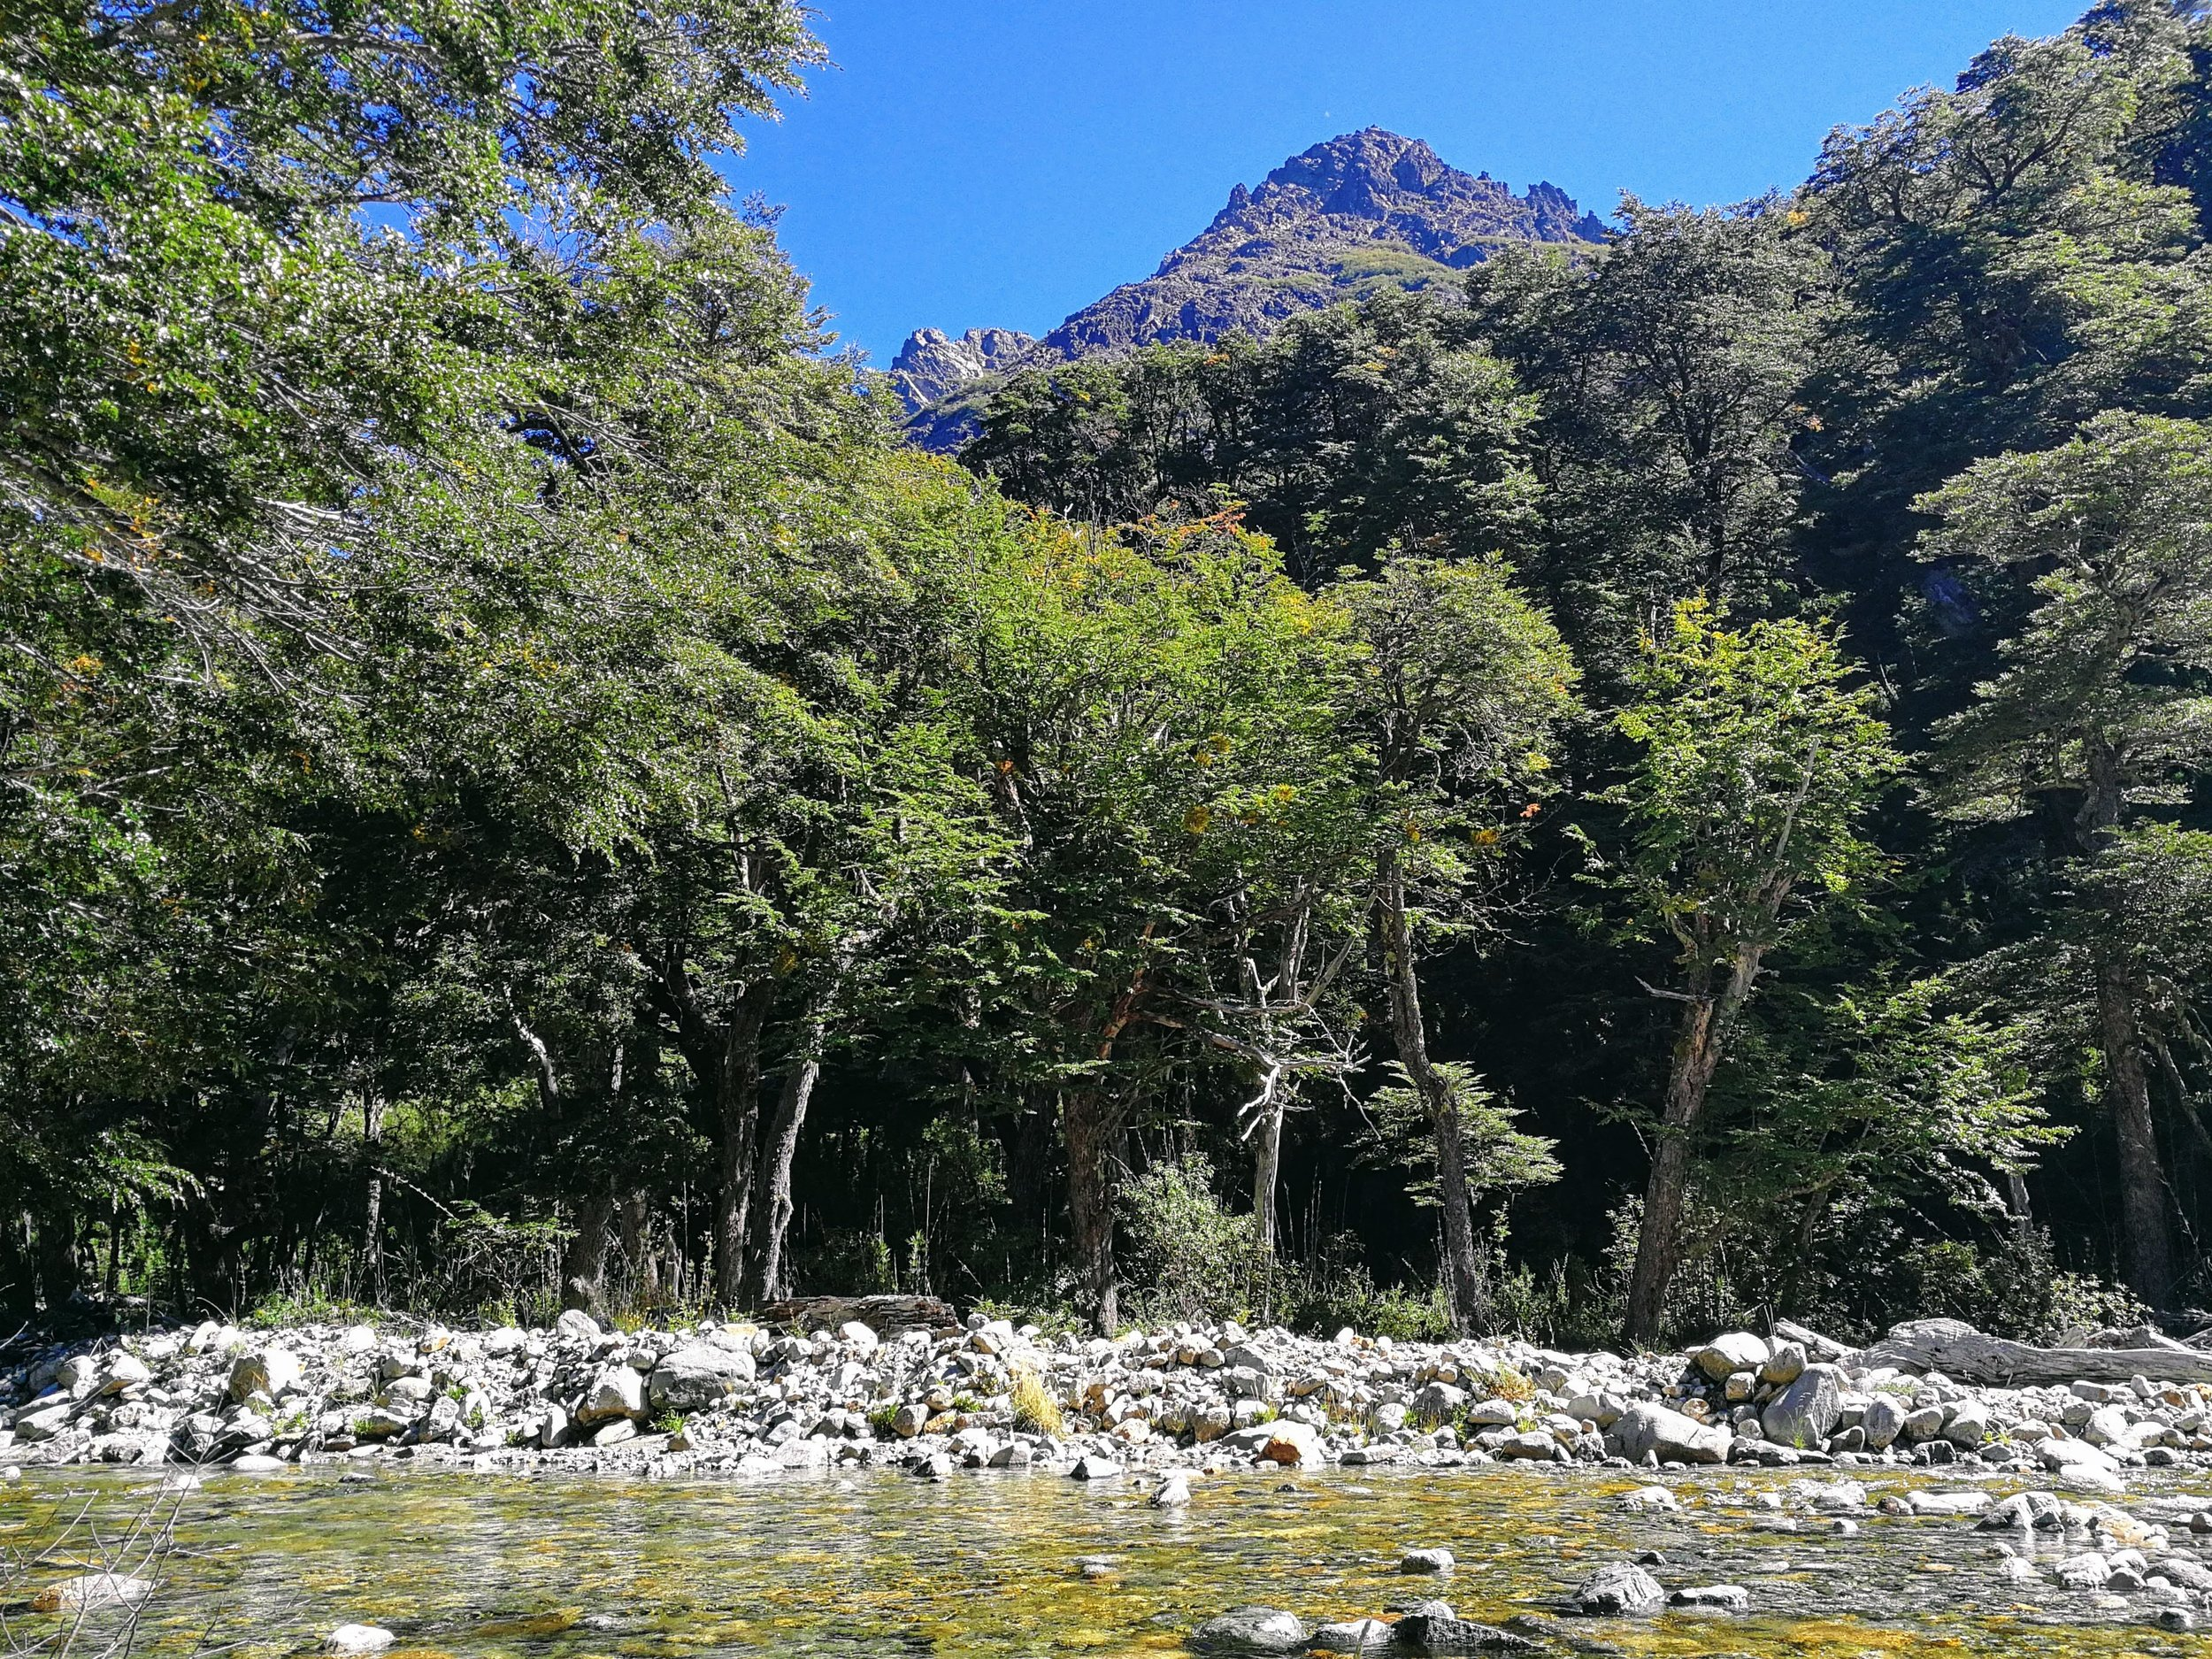 laguna negra rio negro colonia suiza hiking guide how to get to Argentina adventure explore